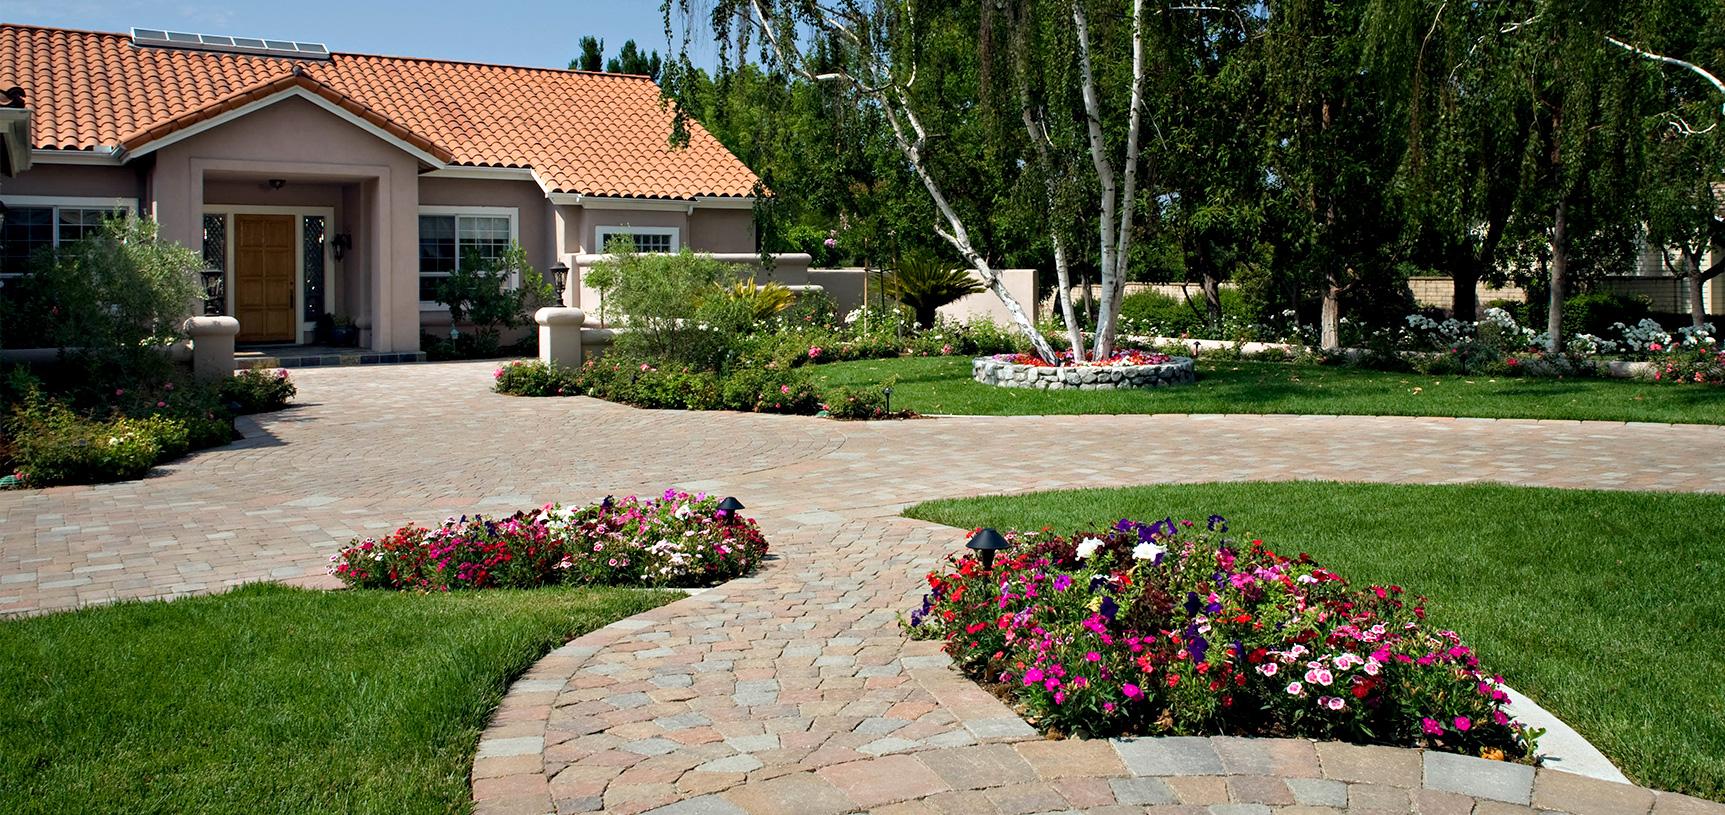 Angelus Concrete Pavers in Orange County, California